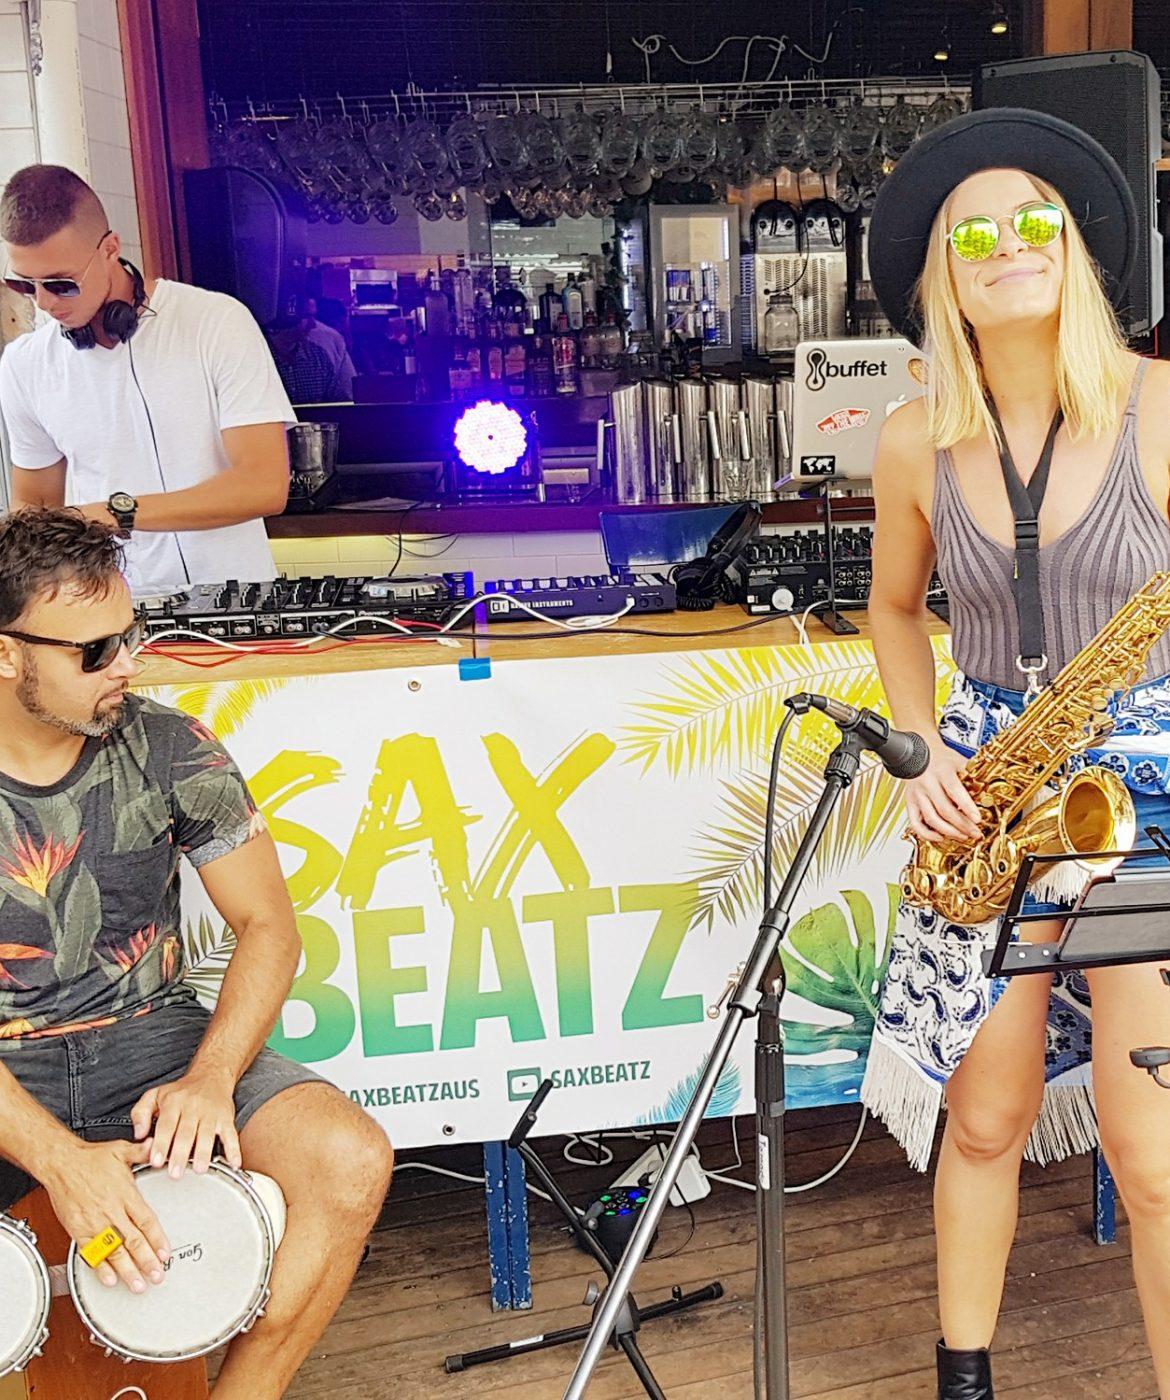 Sax Beatz Promo Pic 2